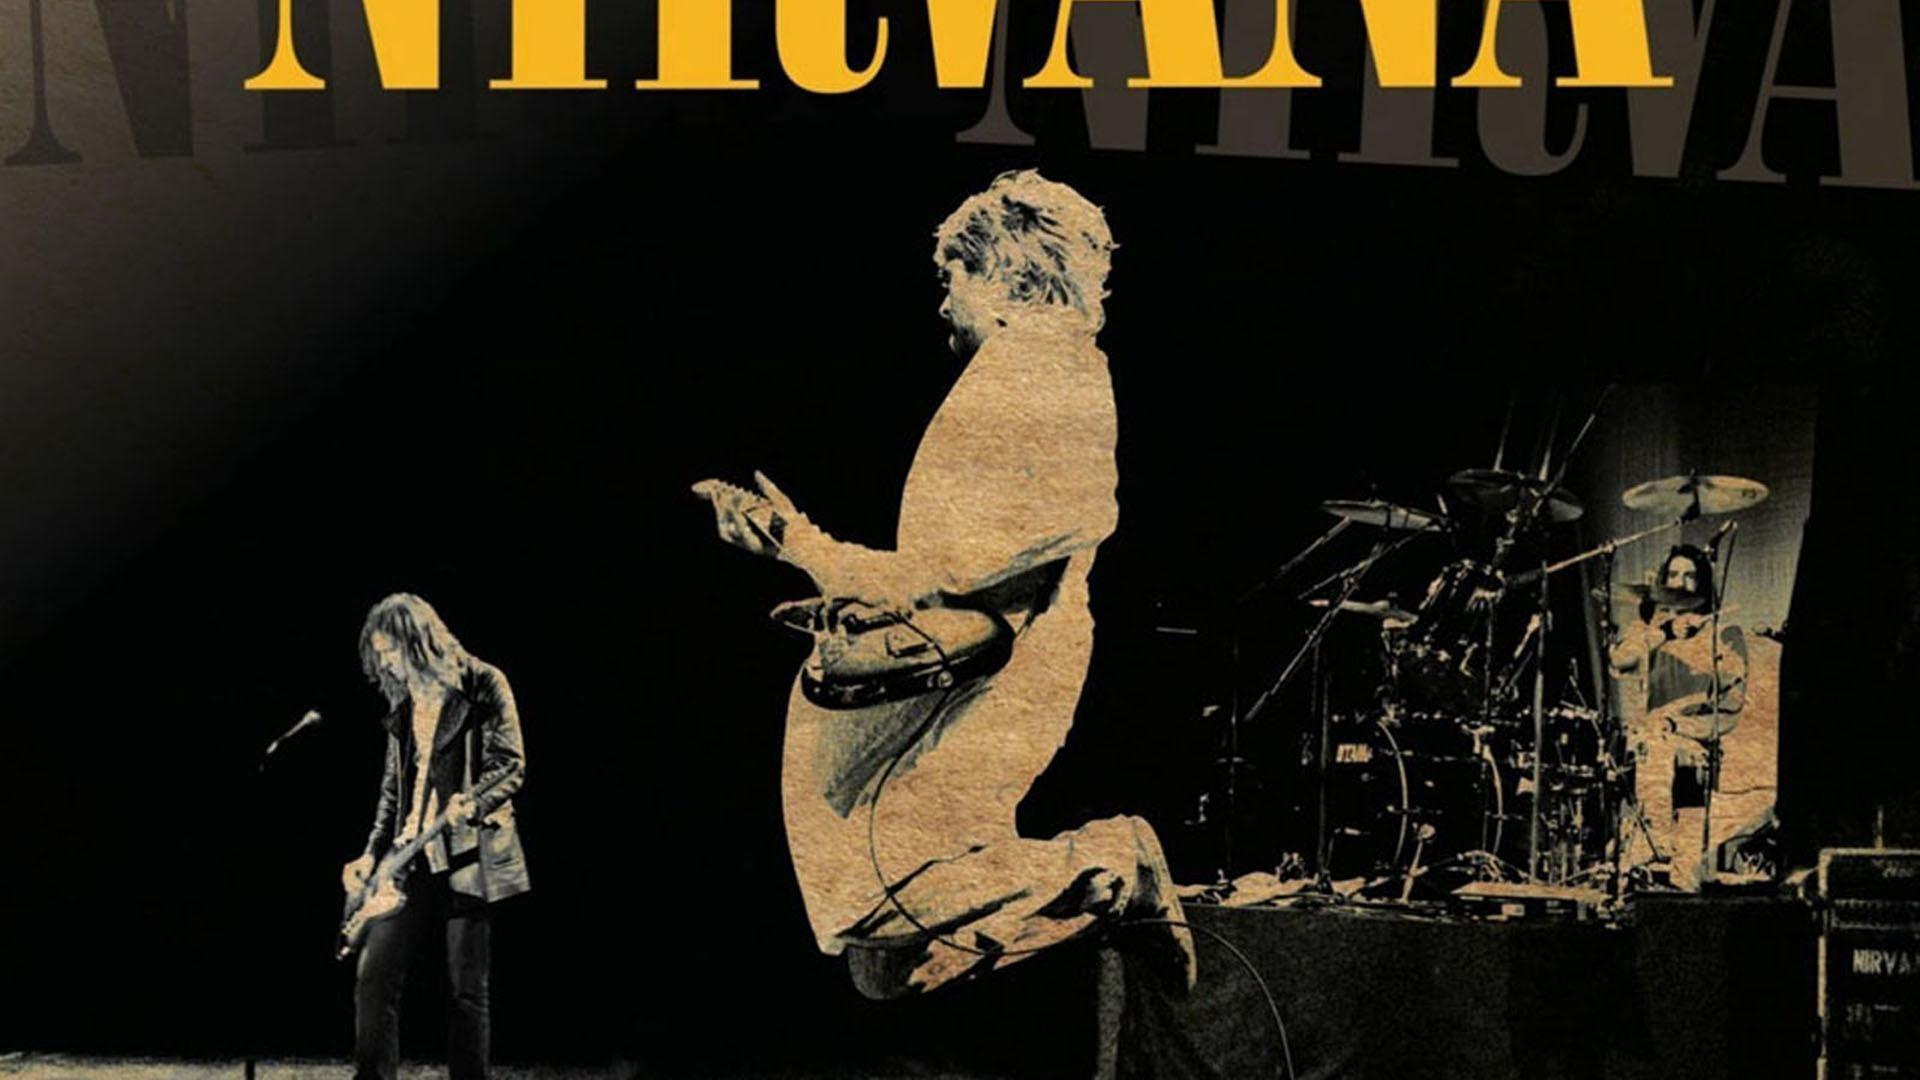 wallpaper.wiki-Nirvana-album-images-1920×1080-PIC-WPE006227